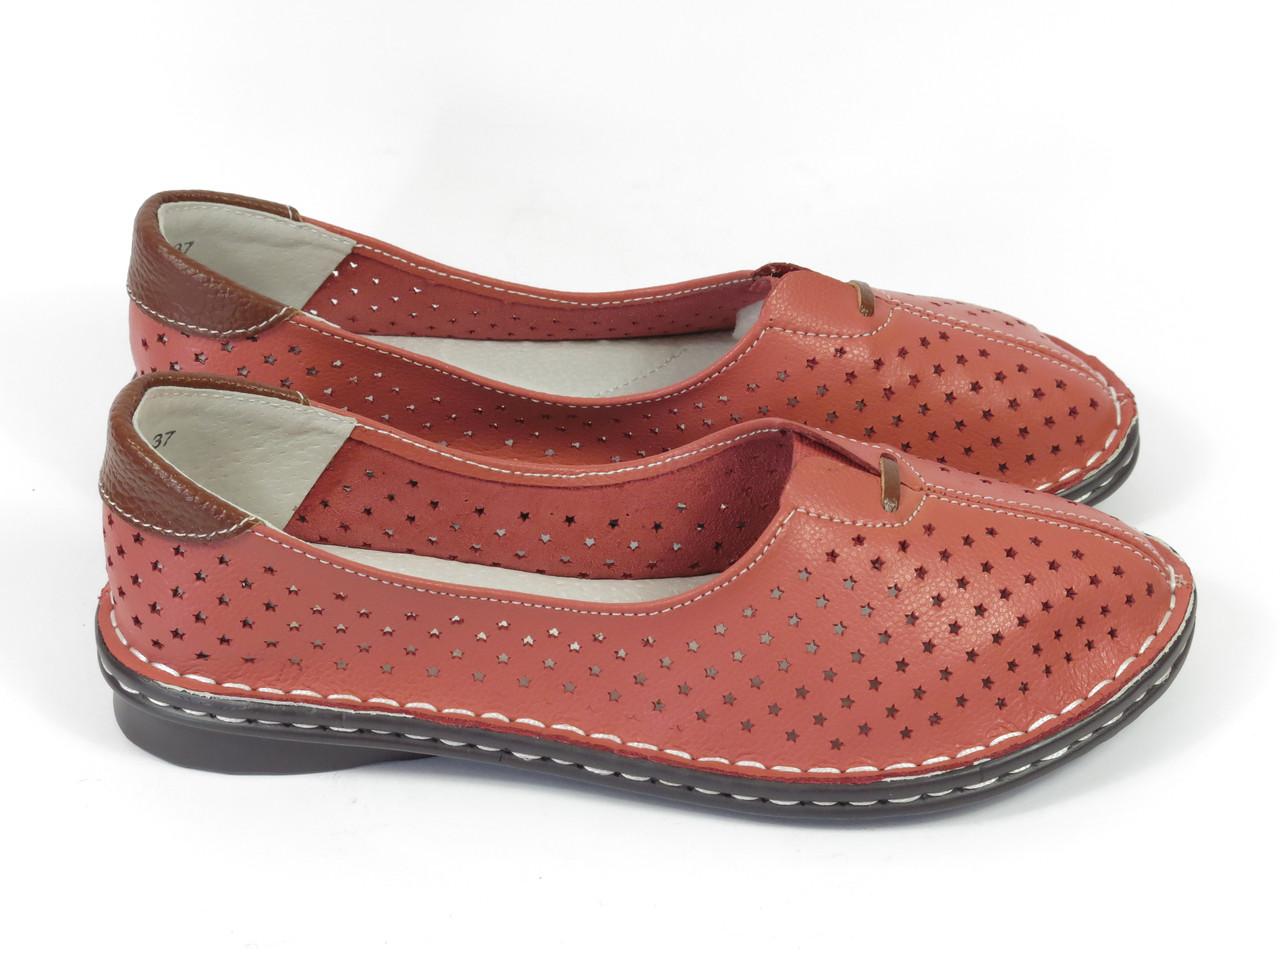 Женские мокасины Allshoes 77937-11 CORALL 36 23,5 см